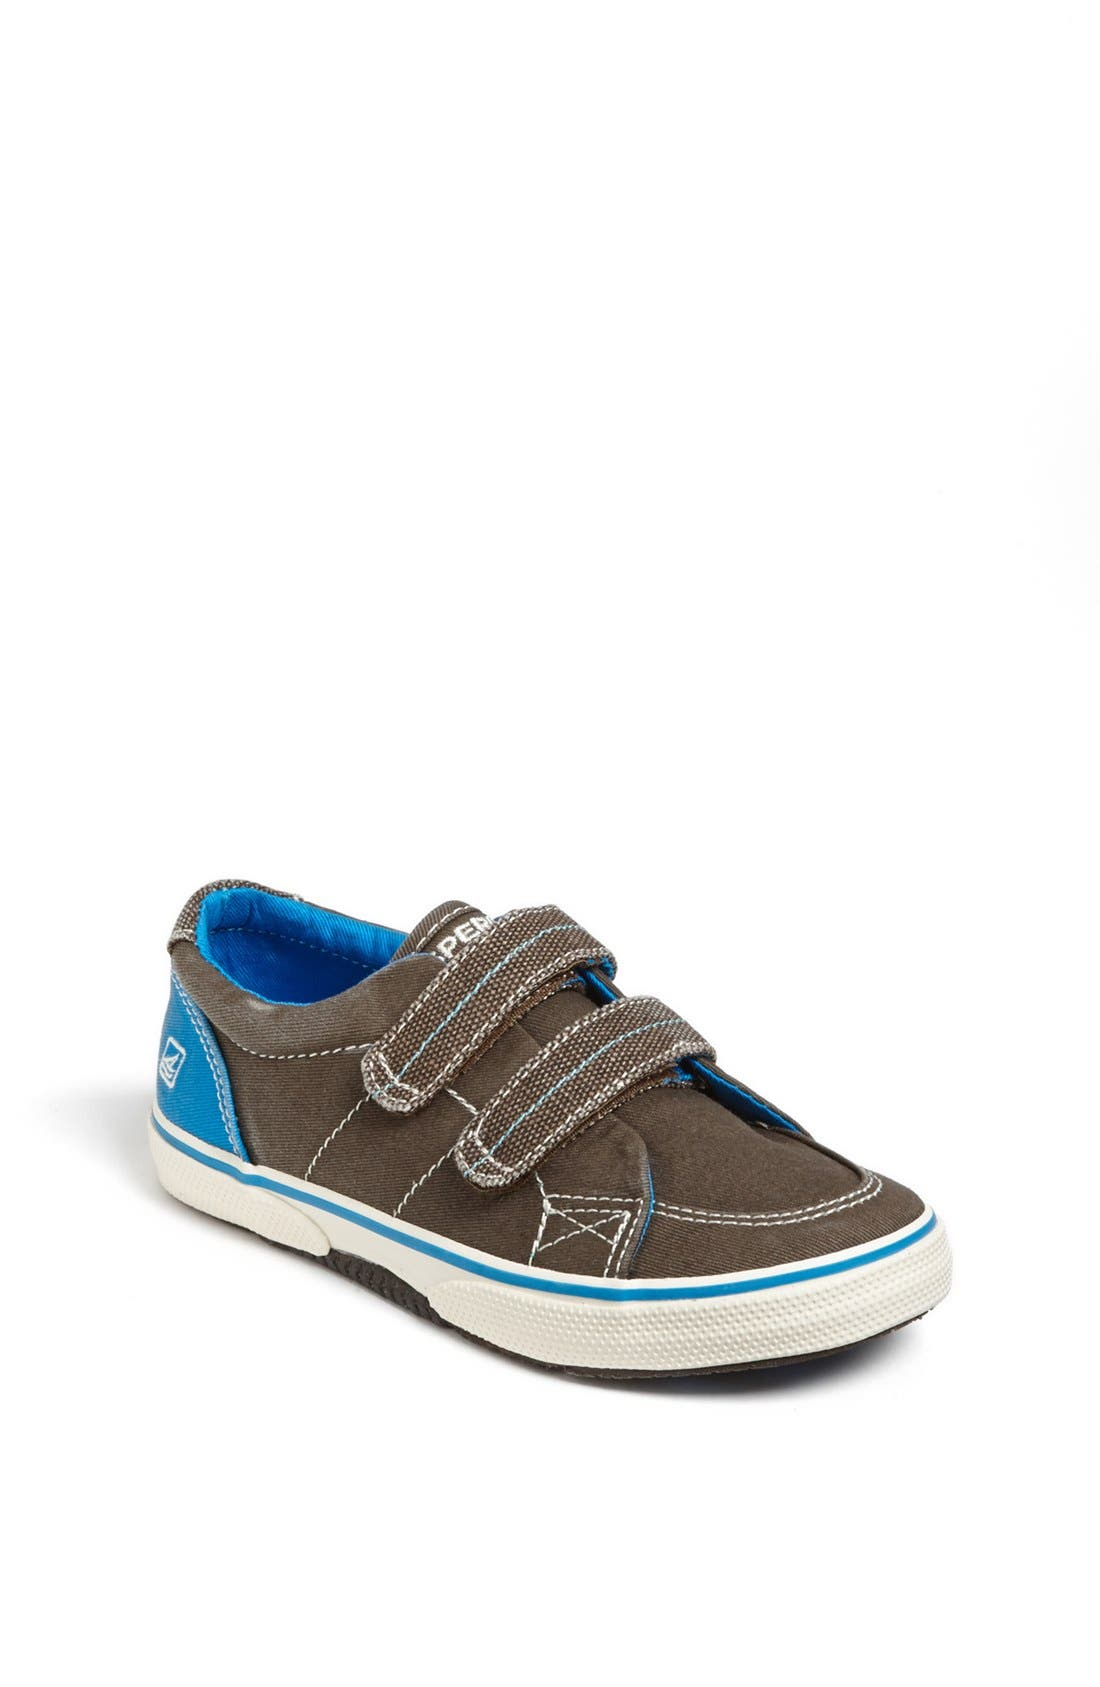 Main Image - Sperry Kids 'Halyard' Sneaker (Walker & Toddler)